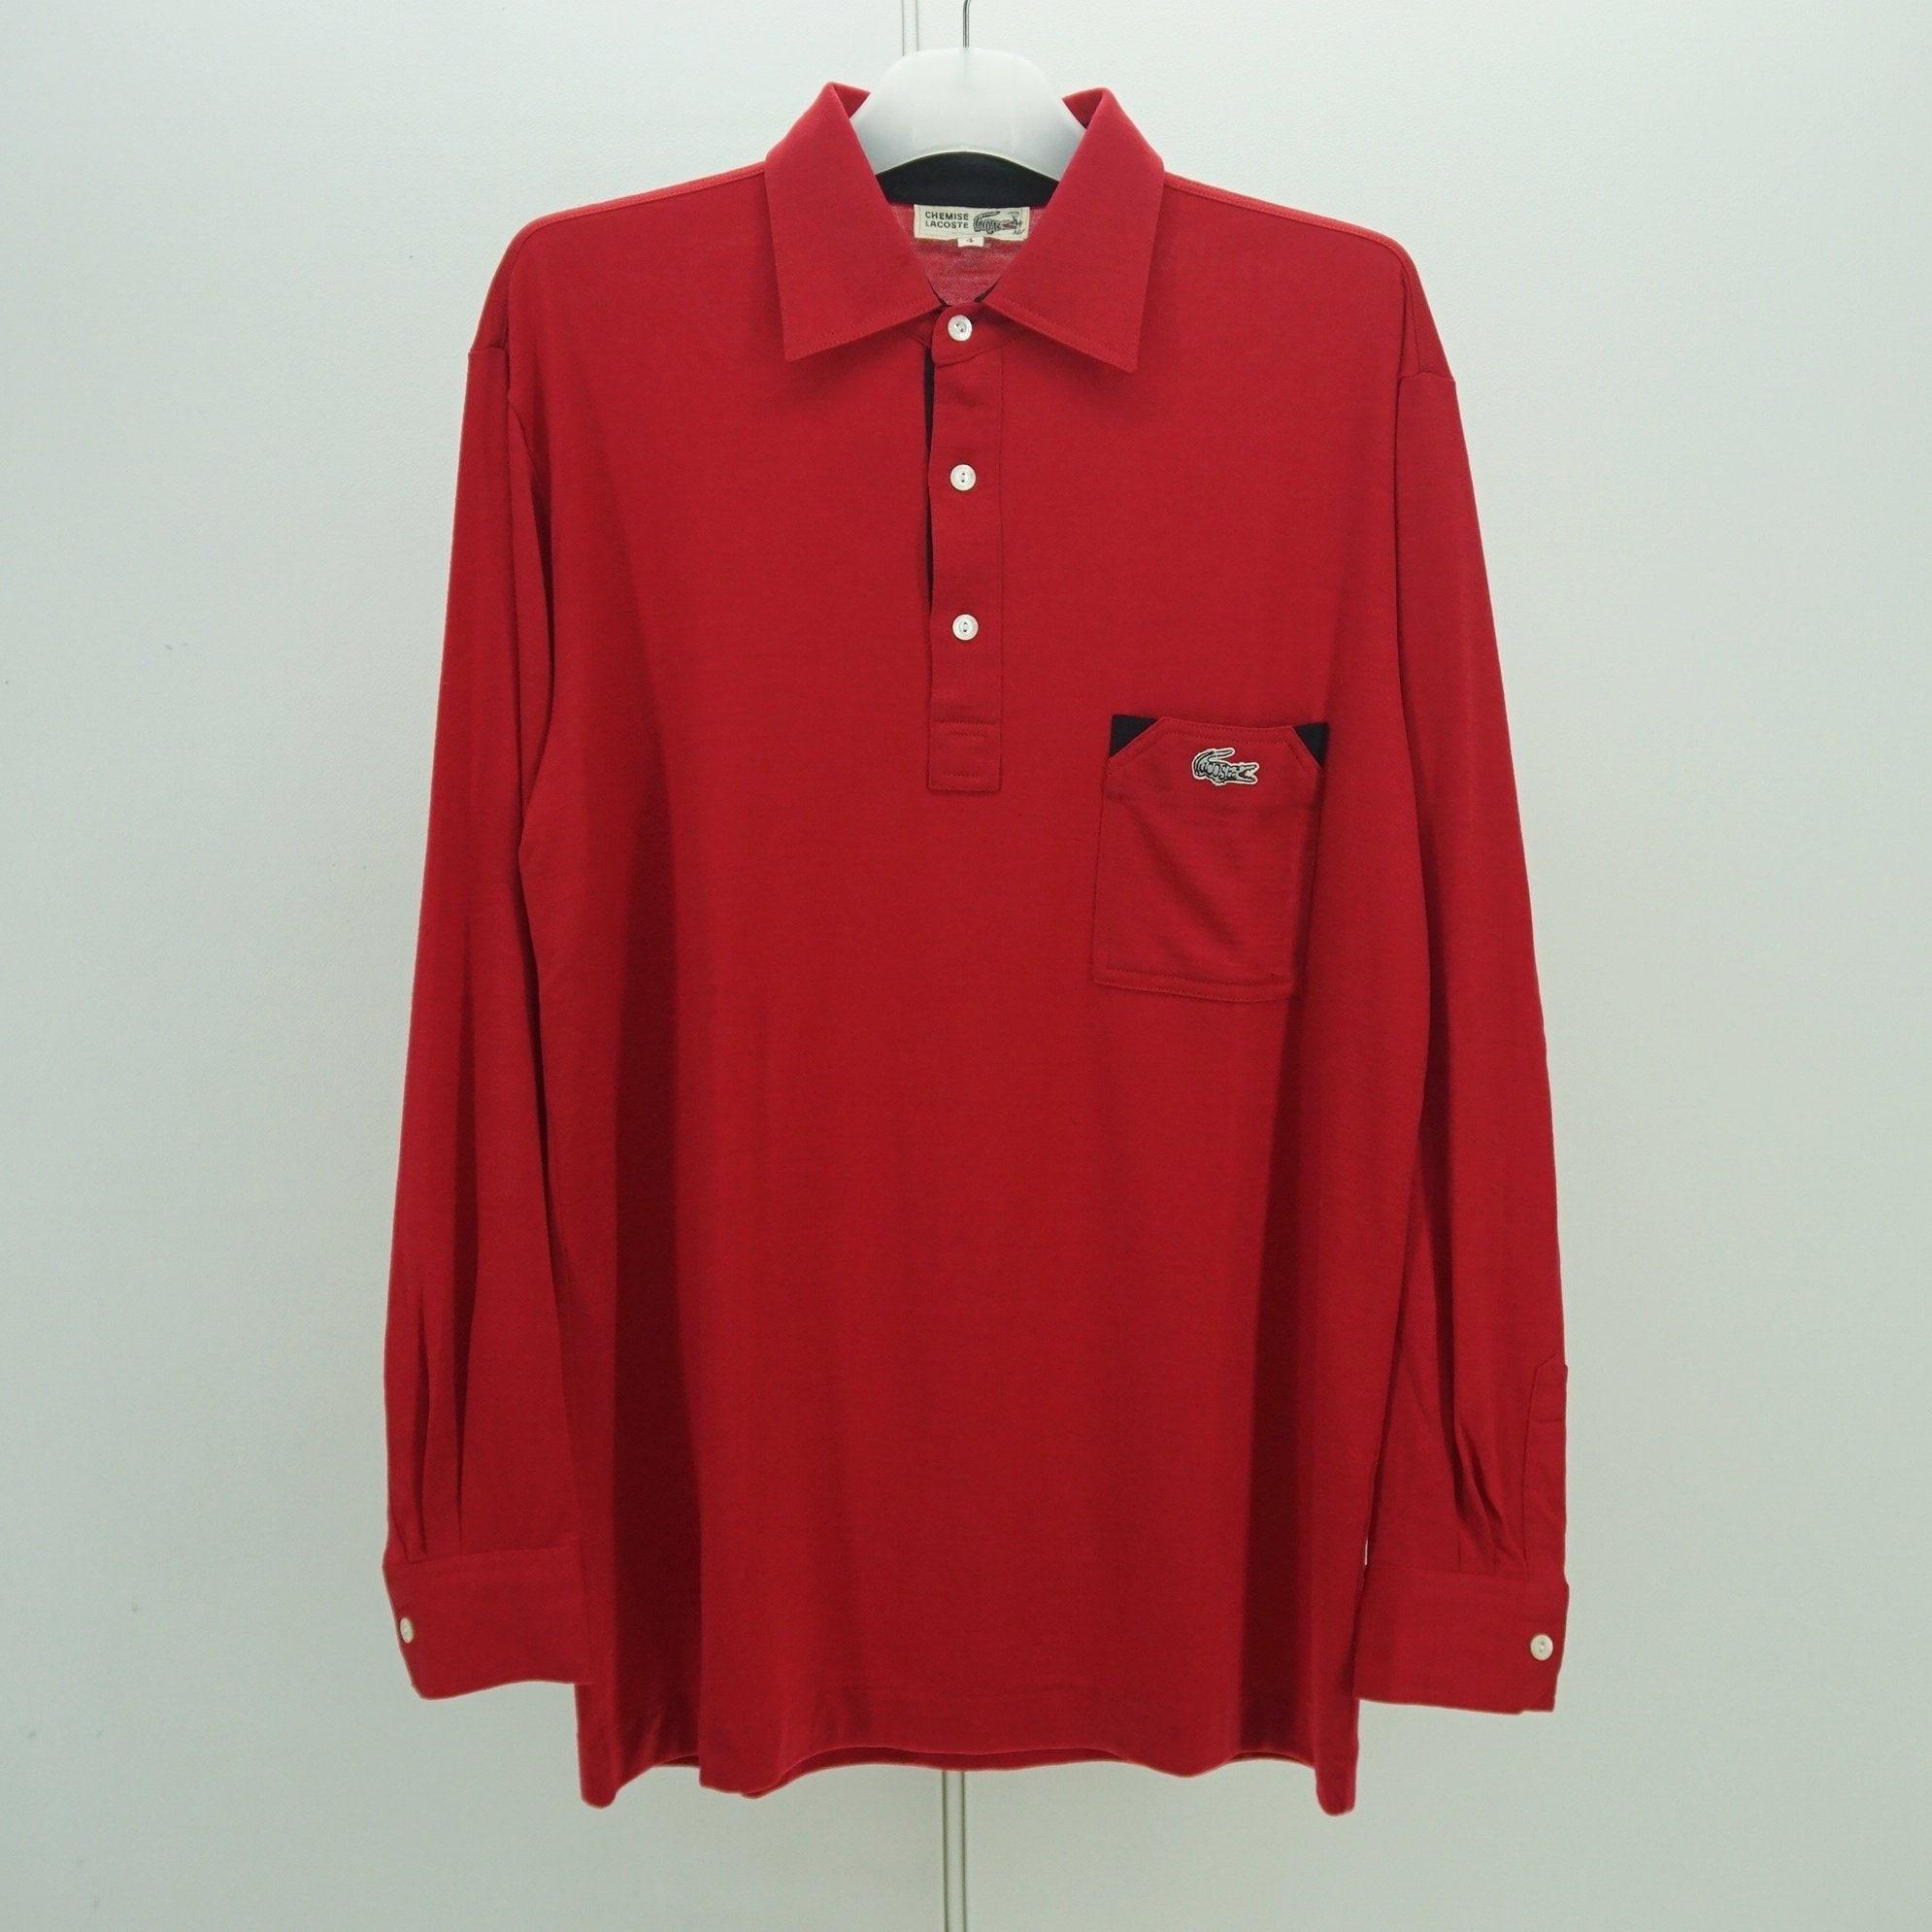 beff090b9 Buy Bulk Lacoste Polo Shirts - DREAMWORKS